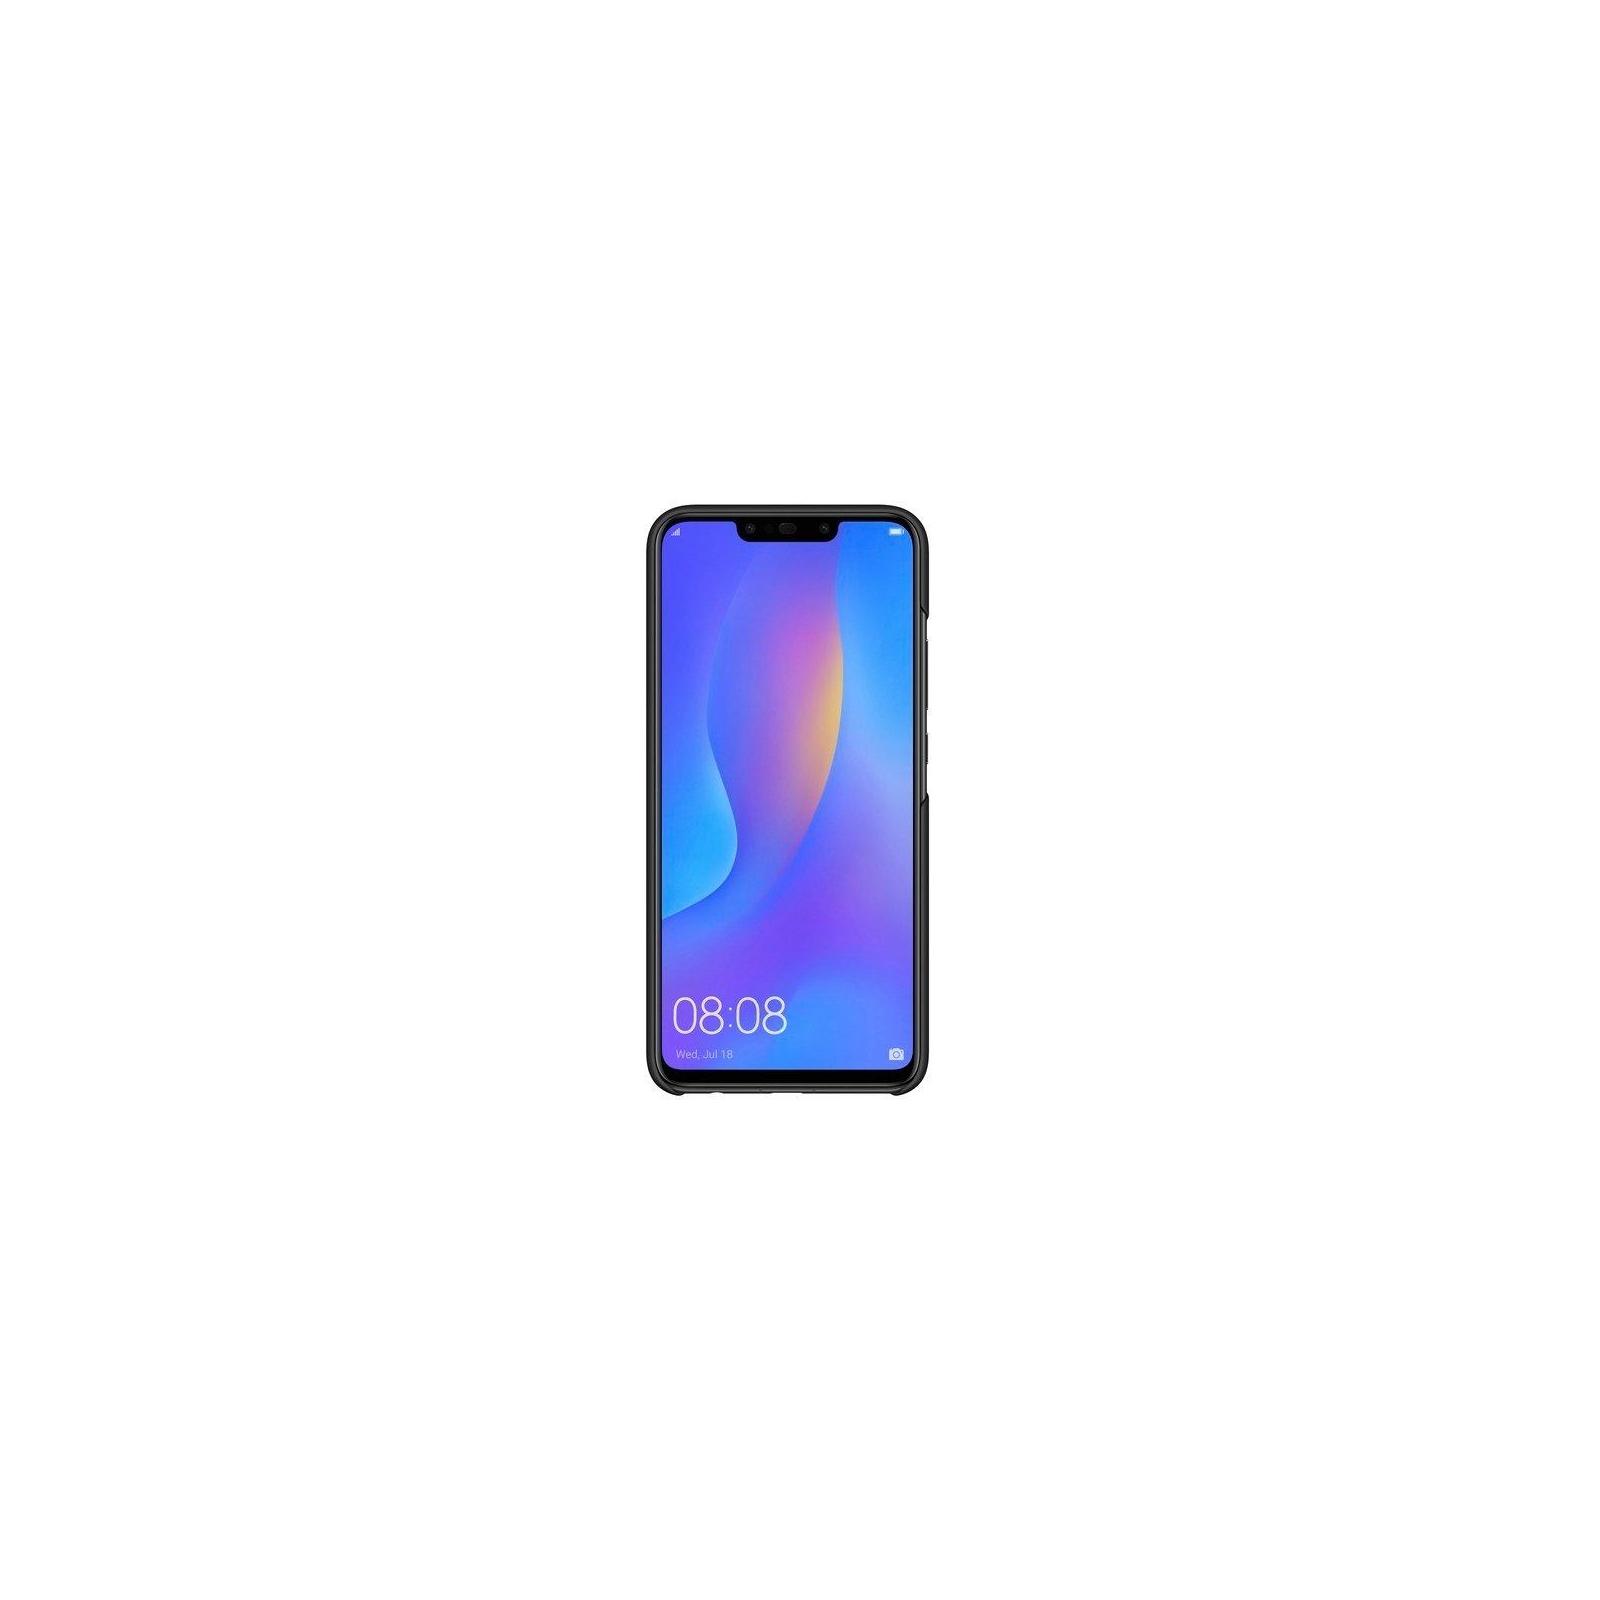 Чехол для моб. телефона Huawei для Huawei P Smart+ Magic Case black (51992698) изображение 4